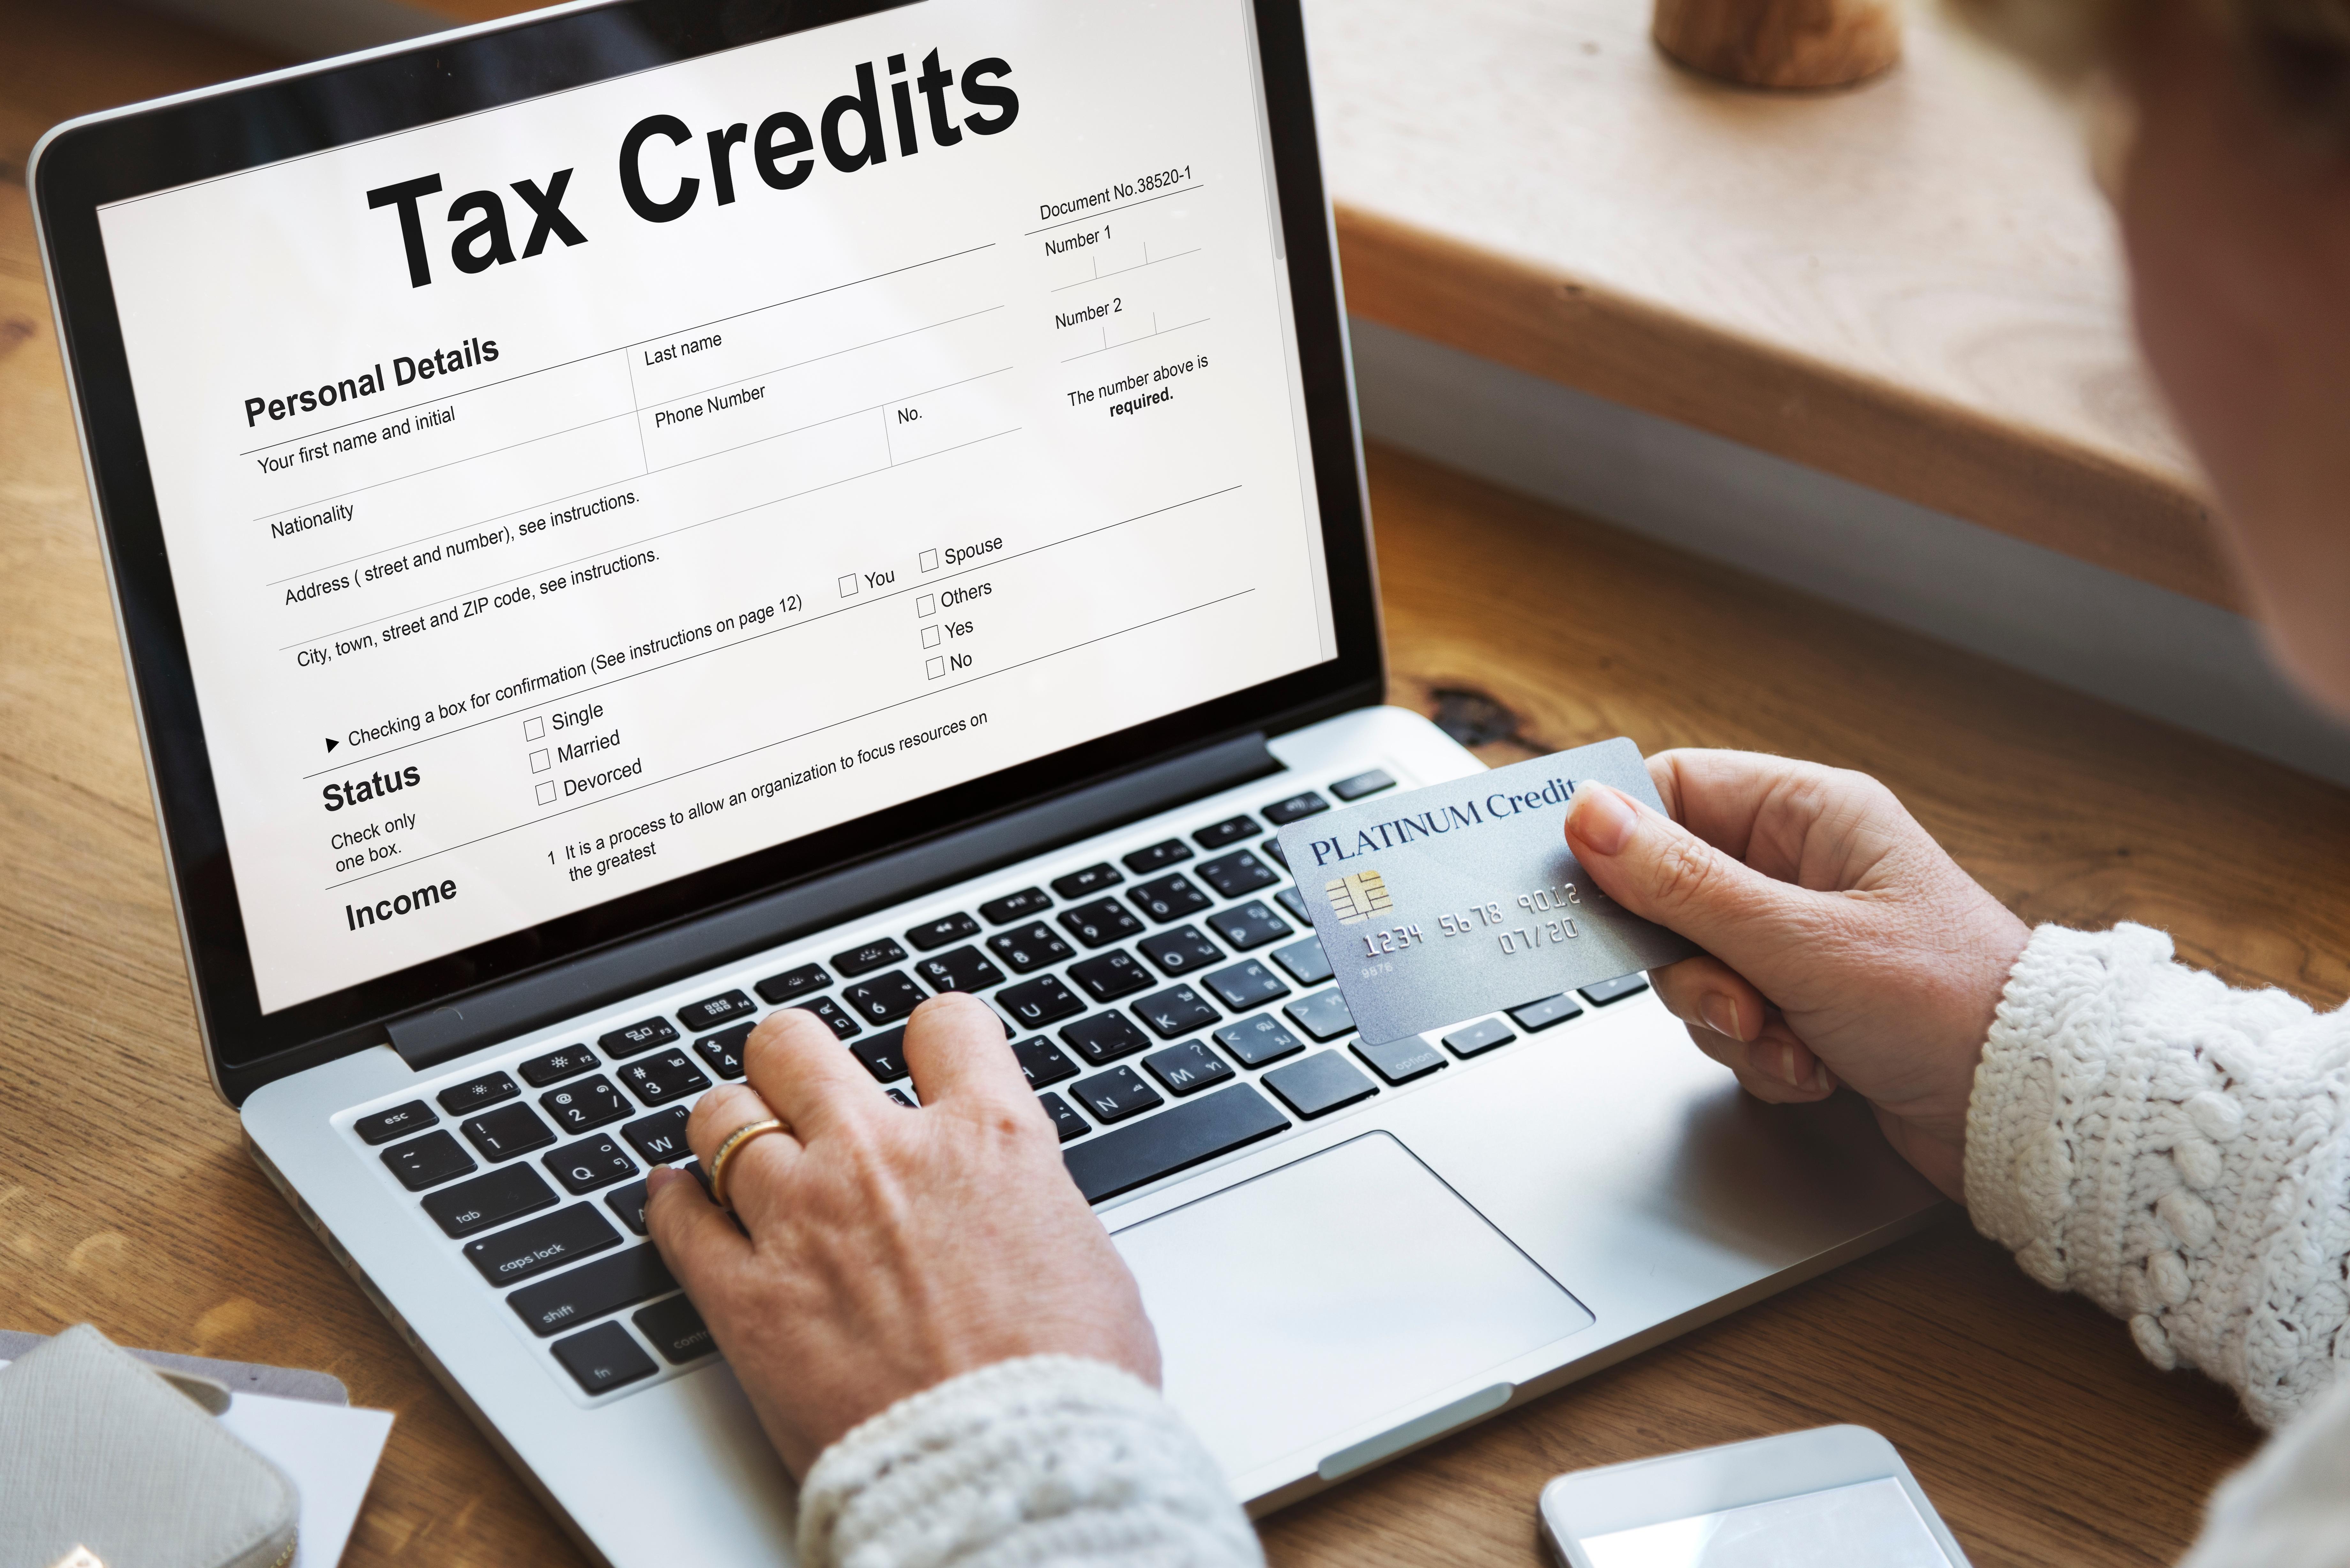 tax-credits-claim-return-deduction-refund-concept-PQ22EP9